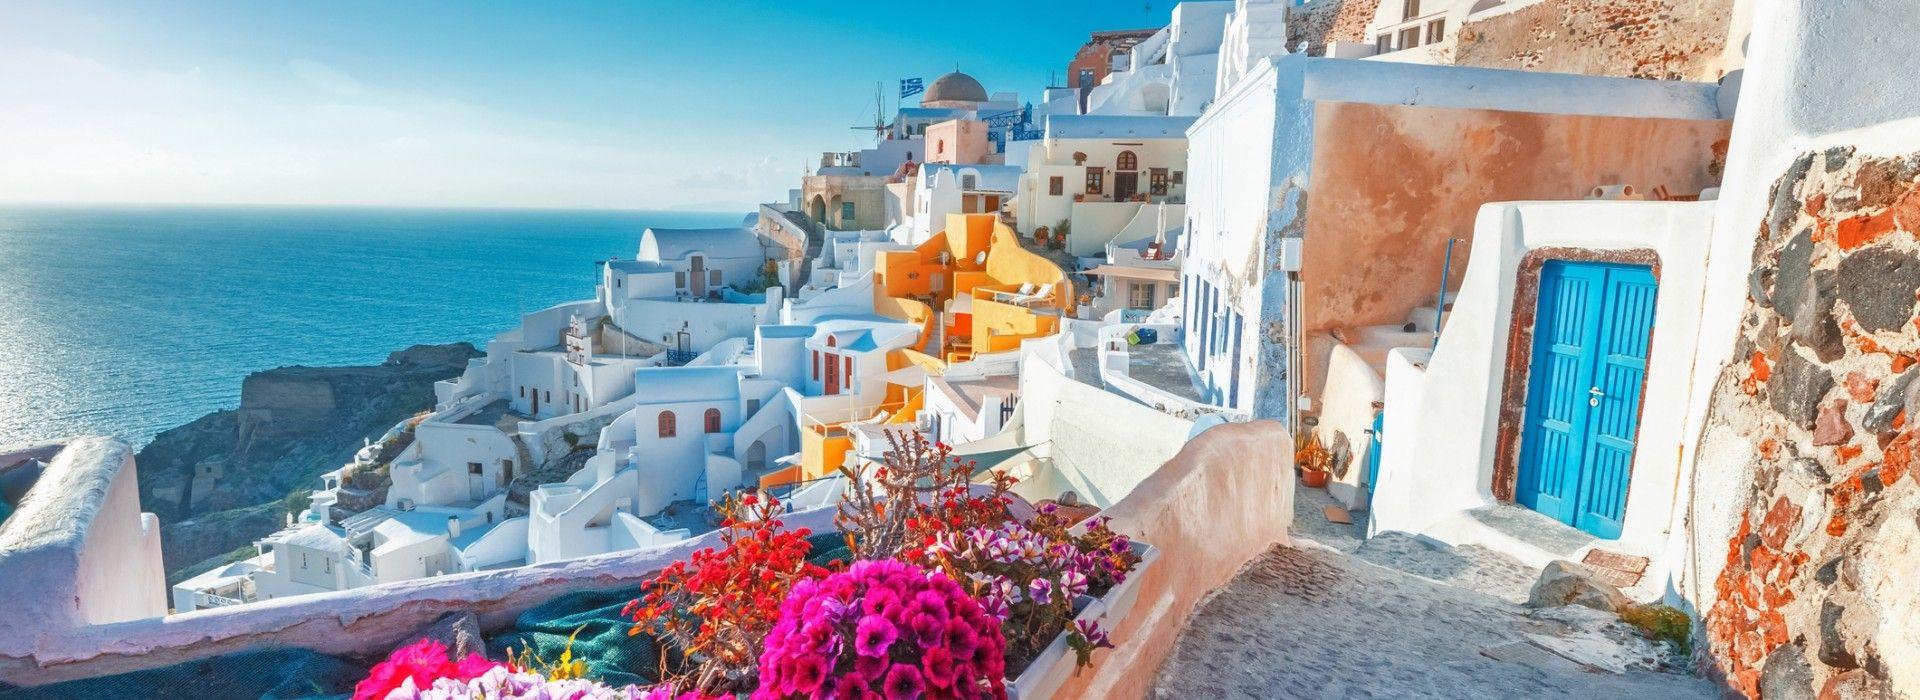 Food tours in Mediterranean